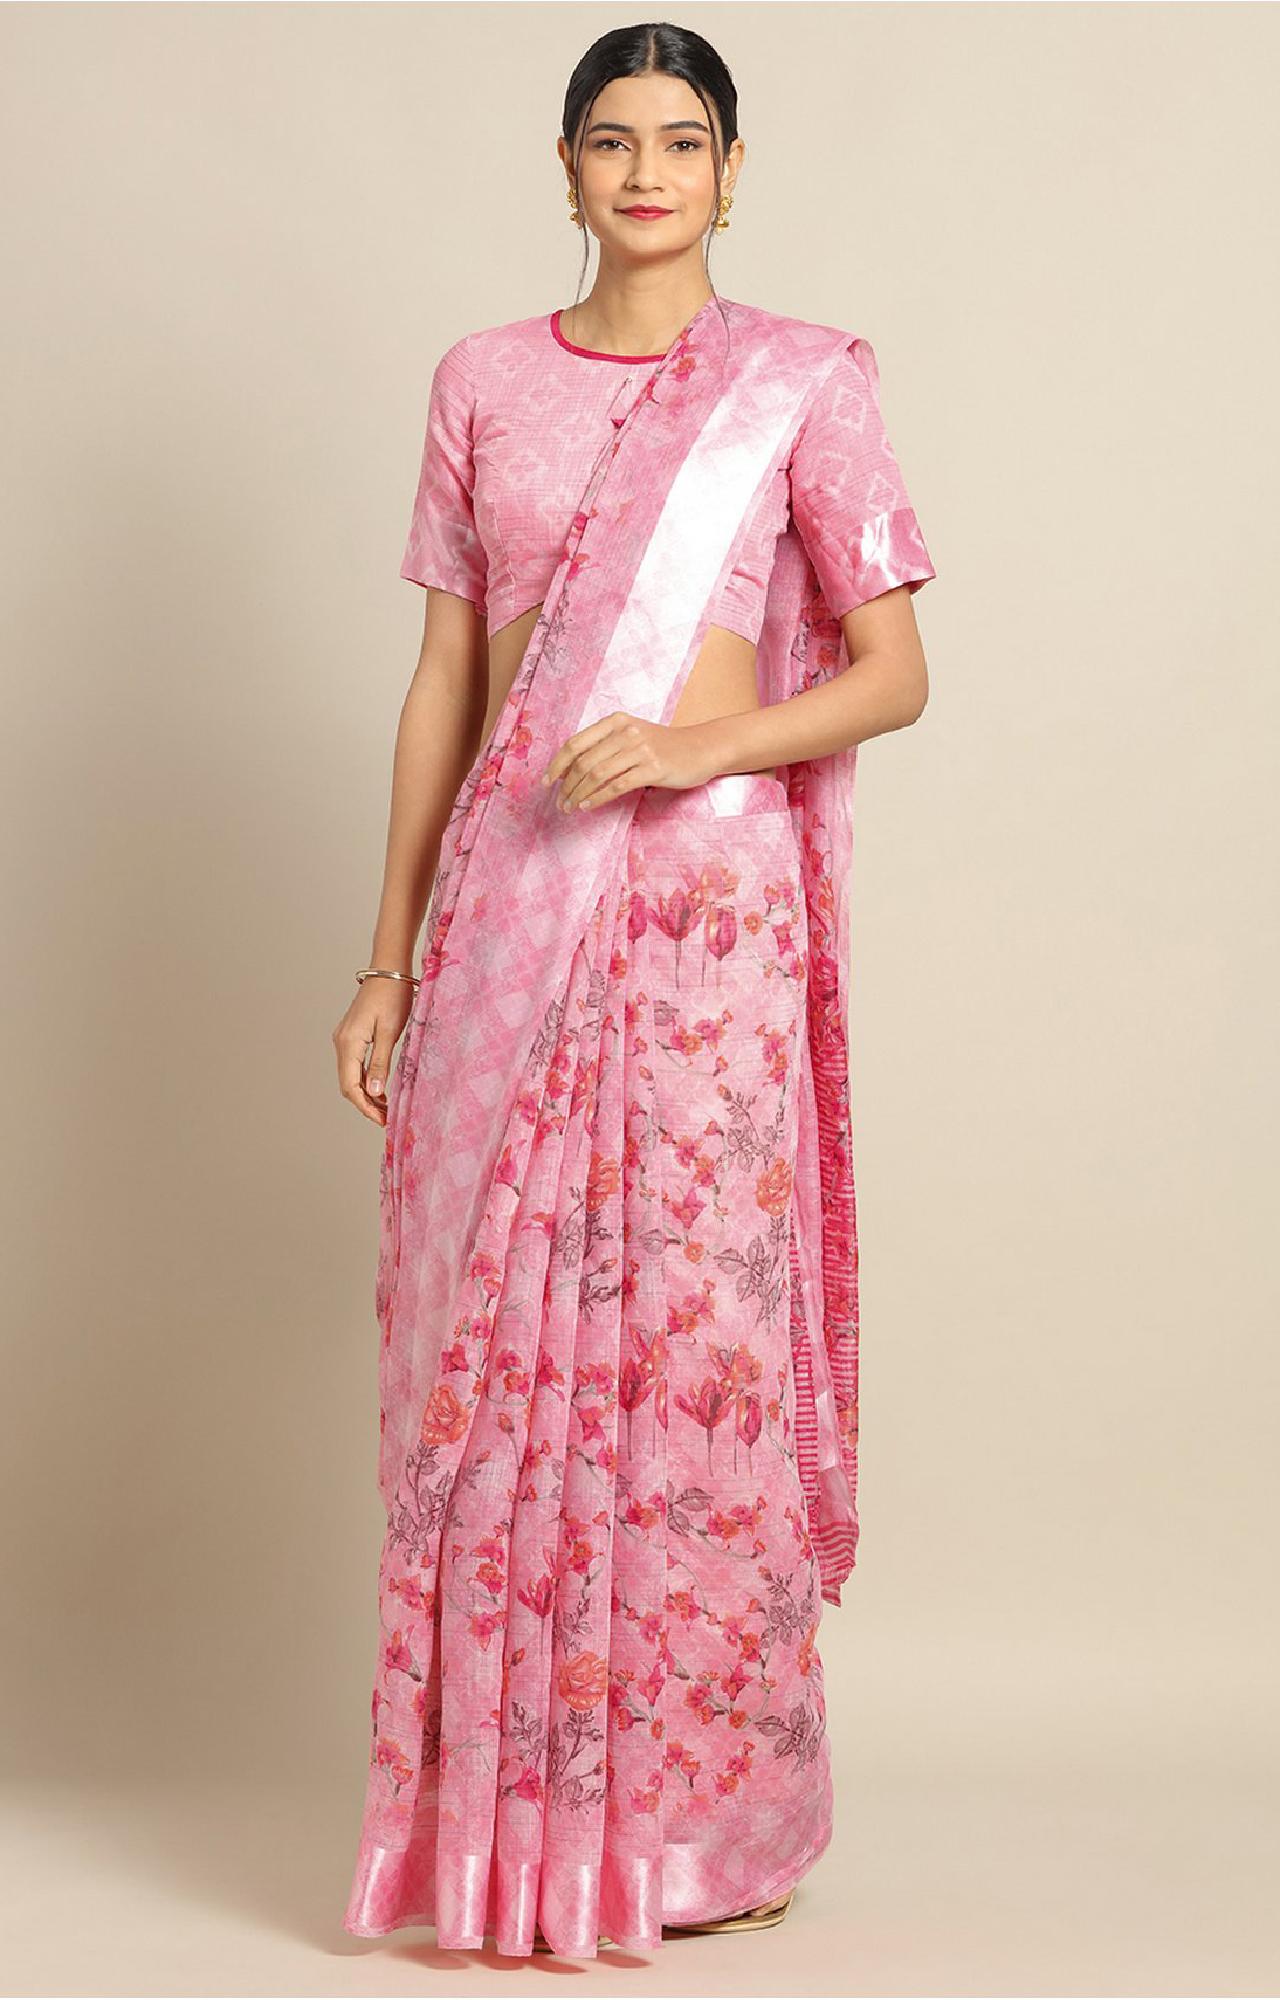 SATIMA | Pink Linen Cotton Flower Print with Satin Border